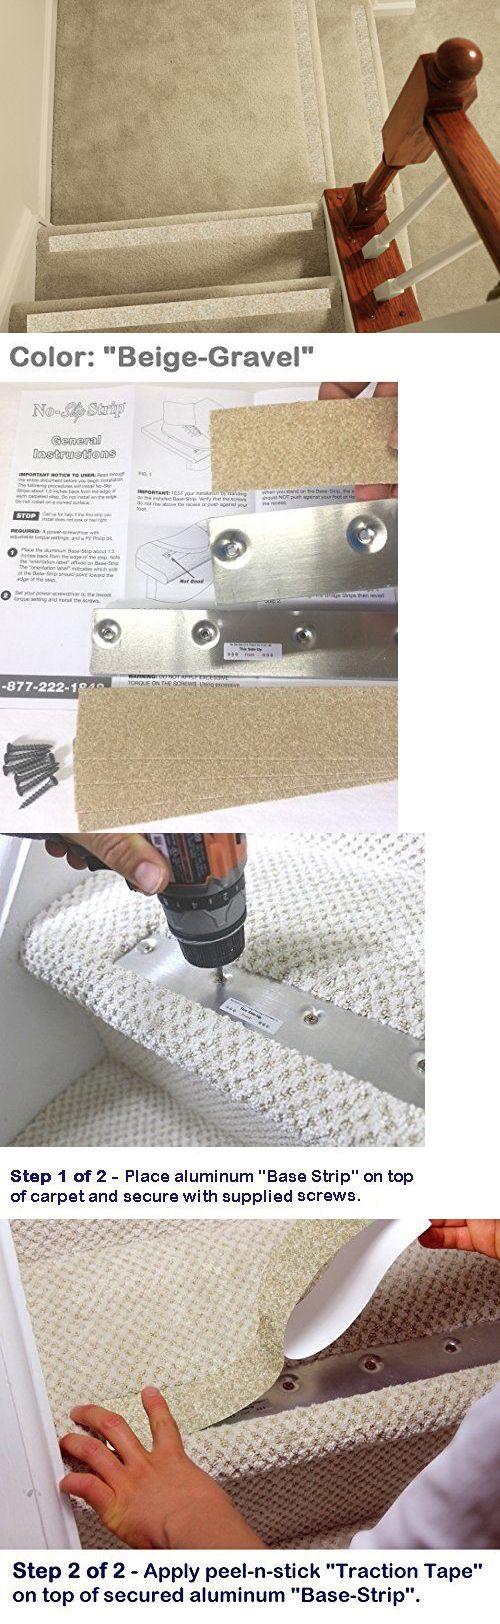 X5 Pcs Non Slip Tread Nosing For Carpet Stairs No Slip Strips | Carpet Stair No Slip Nosing | Stair Tread Nosing | Strips | Non Skid | Laminate Flooring | Gravel